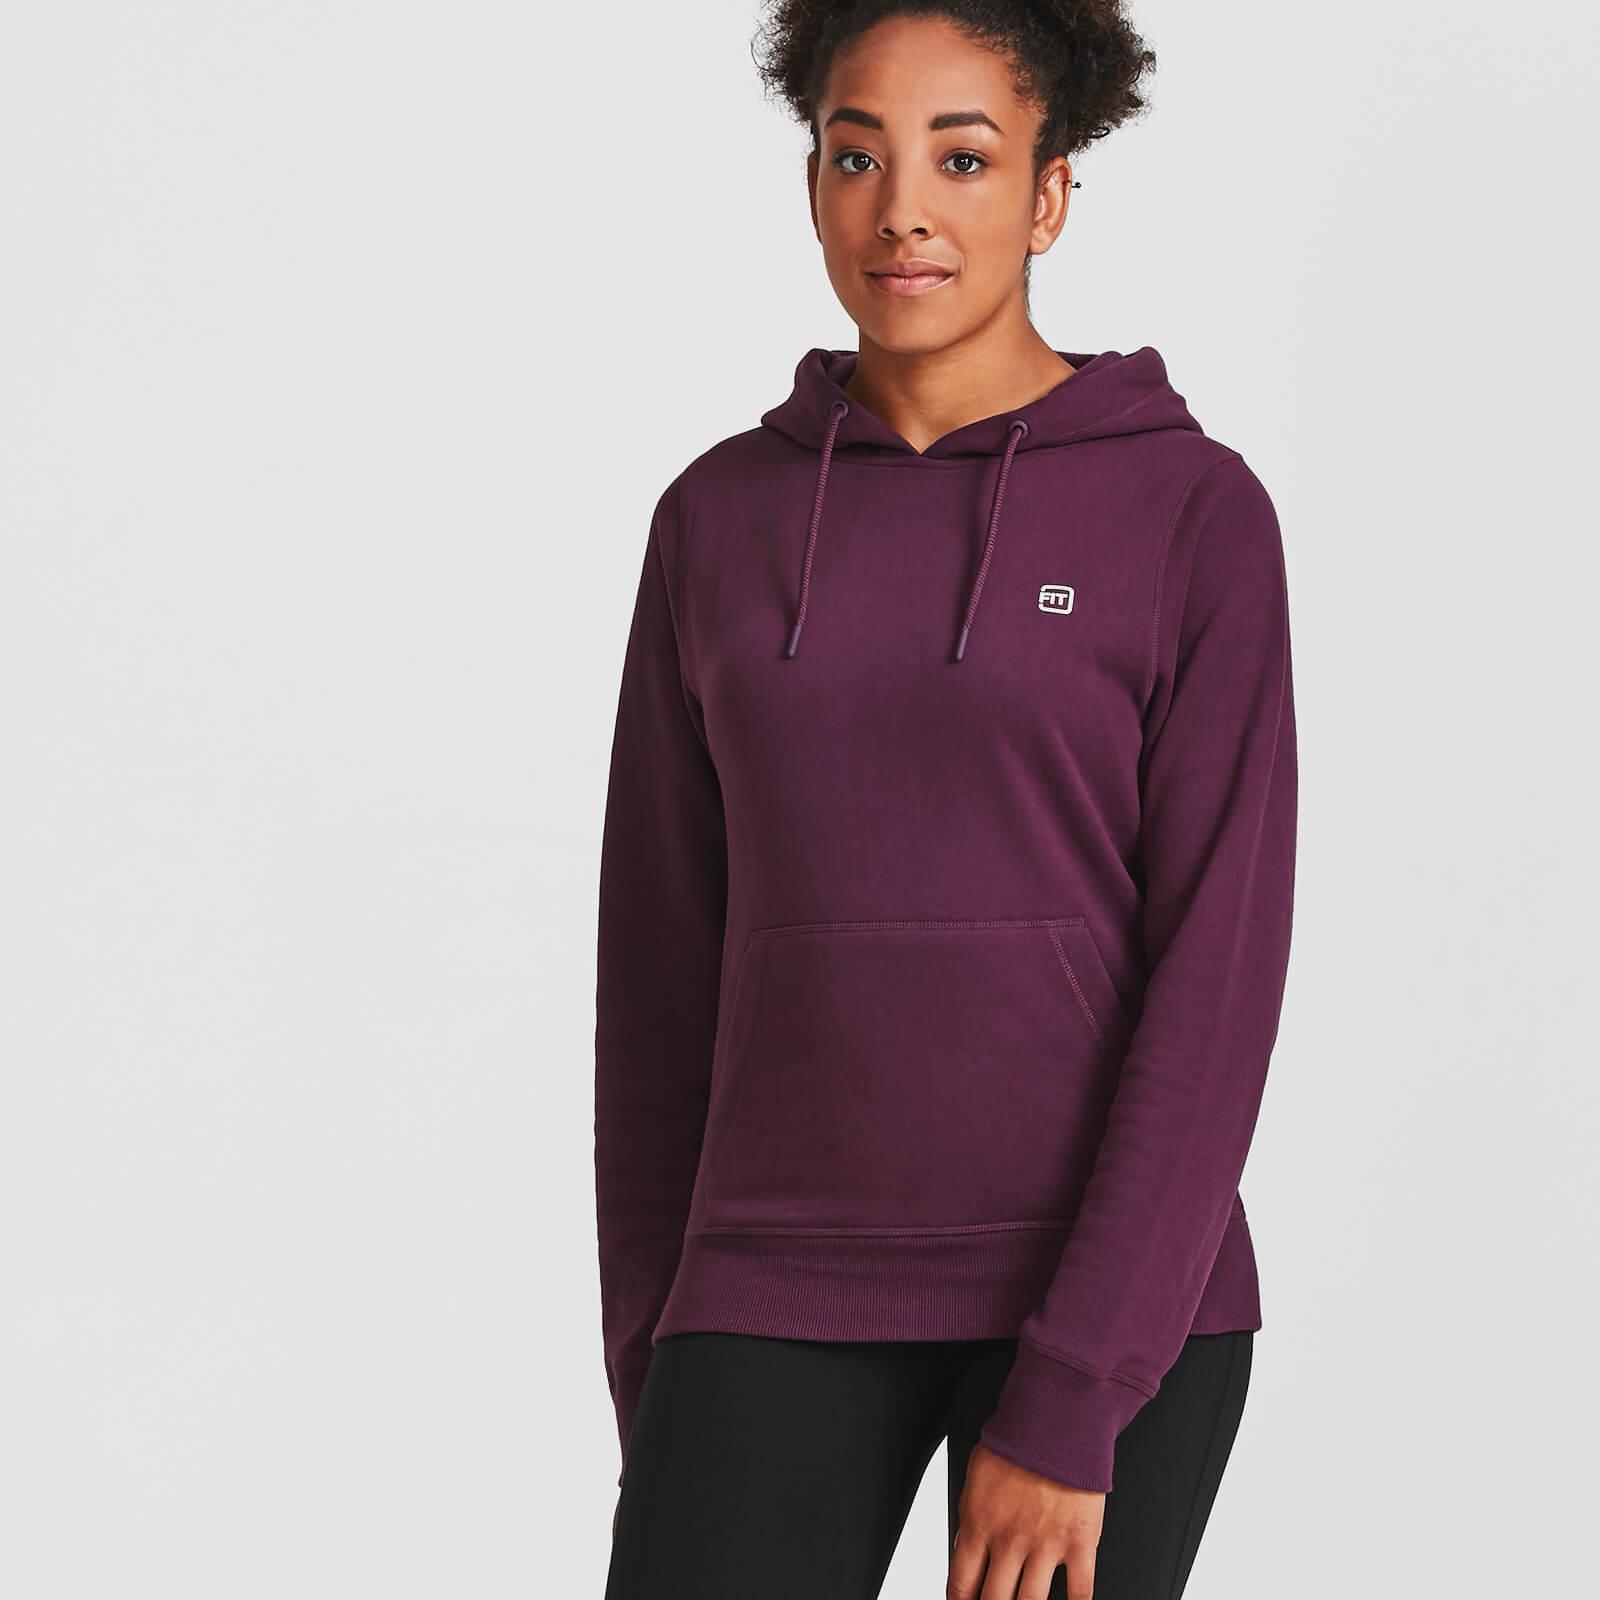 IdealFit Core Pullover Hoodie - S - Purple